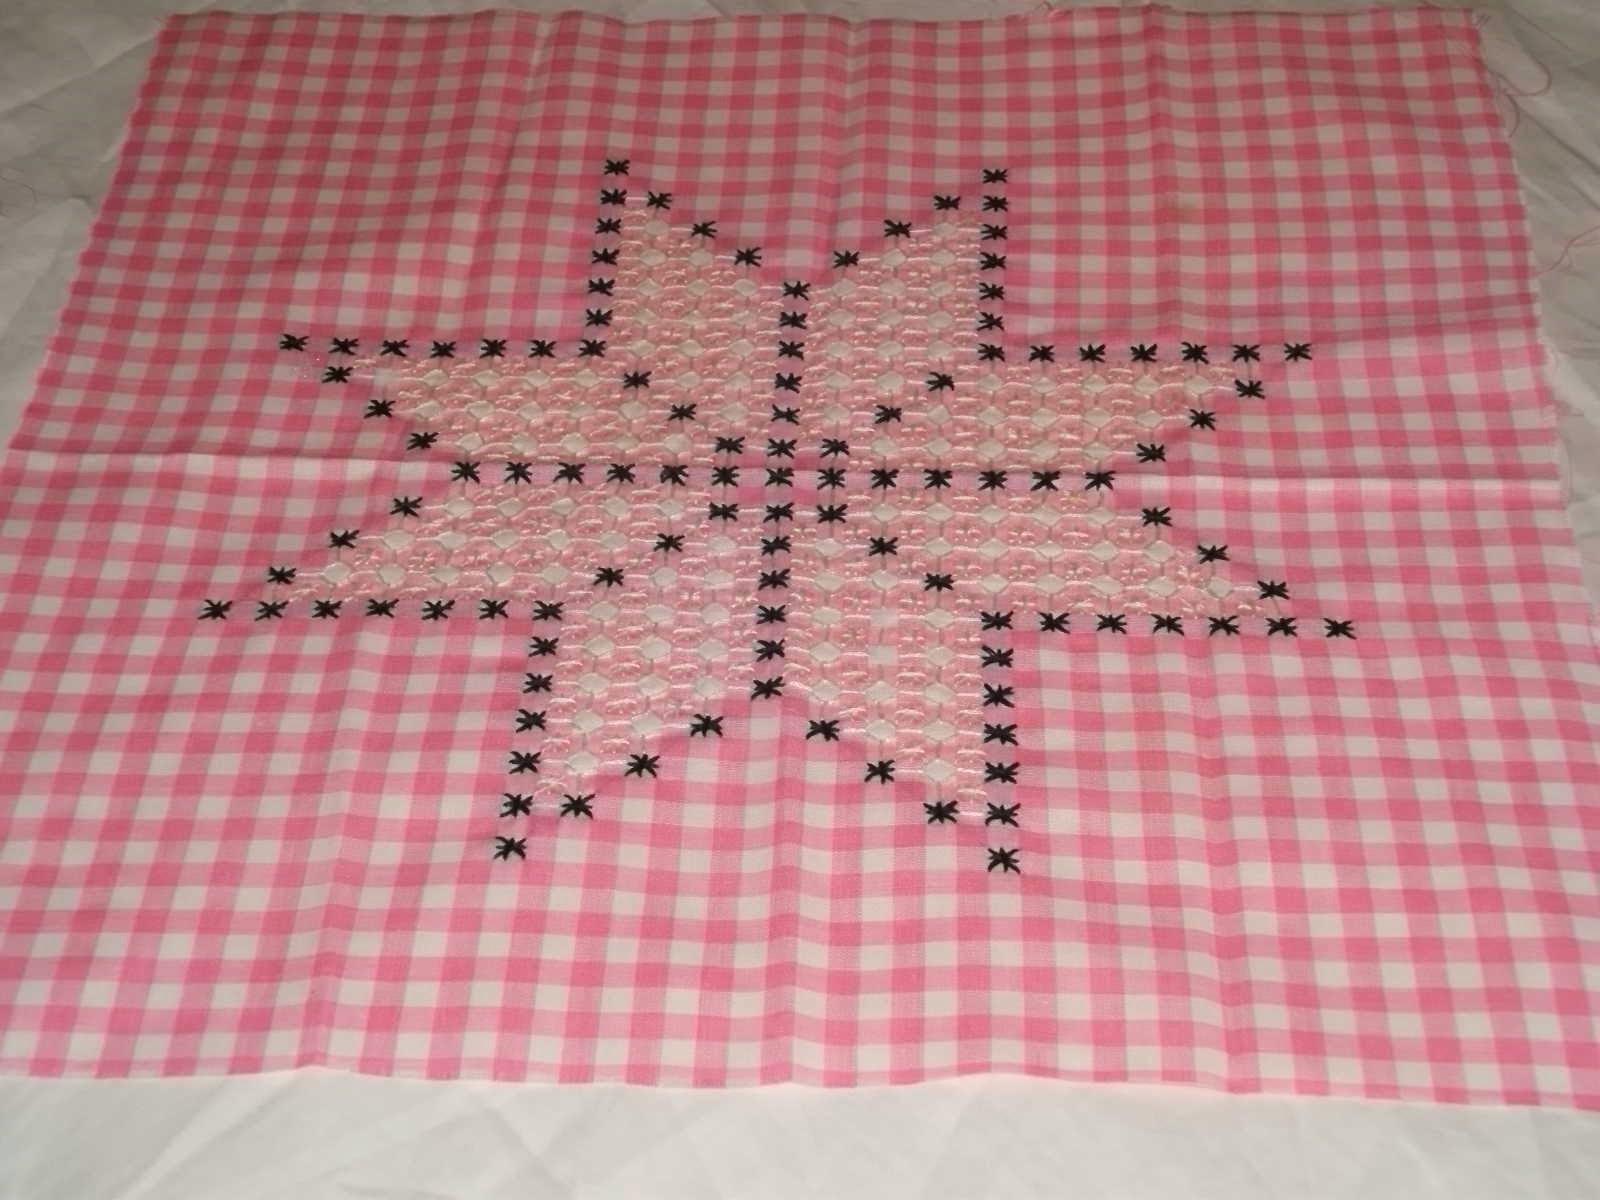 Quilt Patterns Chicken Scratch : judysquiltsandthings: chicken scratch quilt blocks